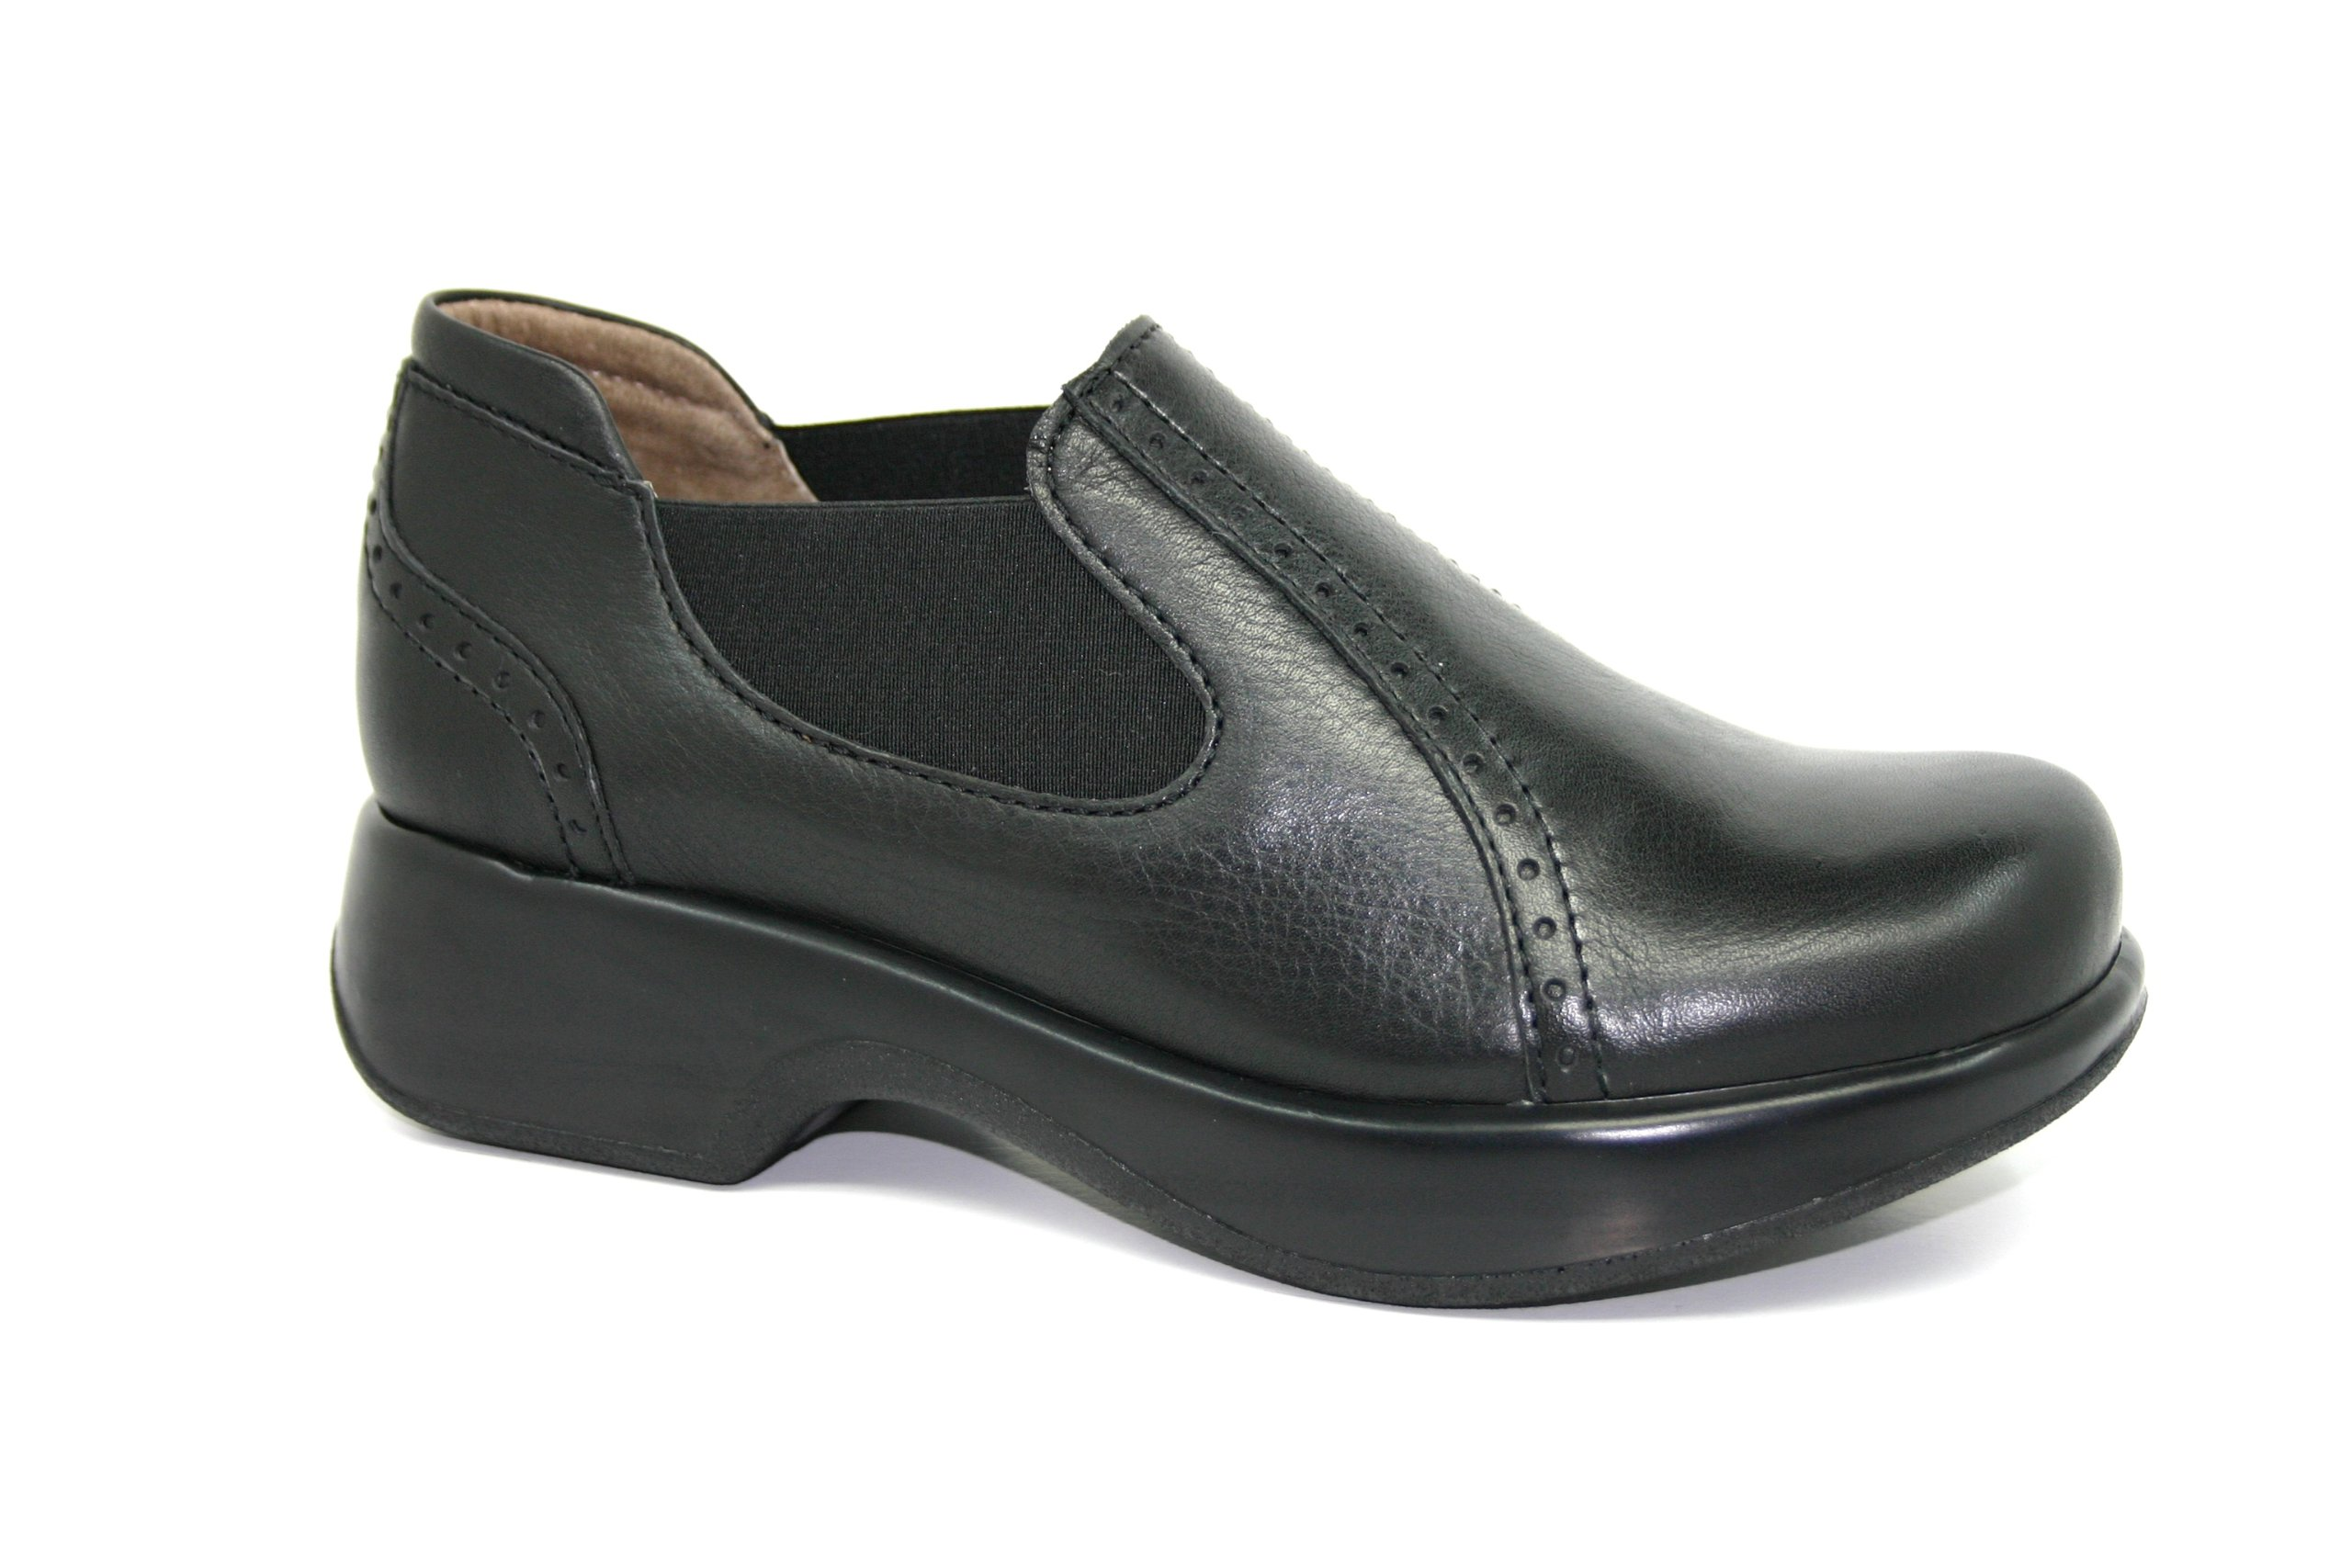 Dromedaris Women's Falcon Platform Shoes,Black,40 M EU